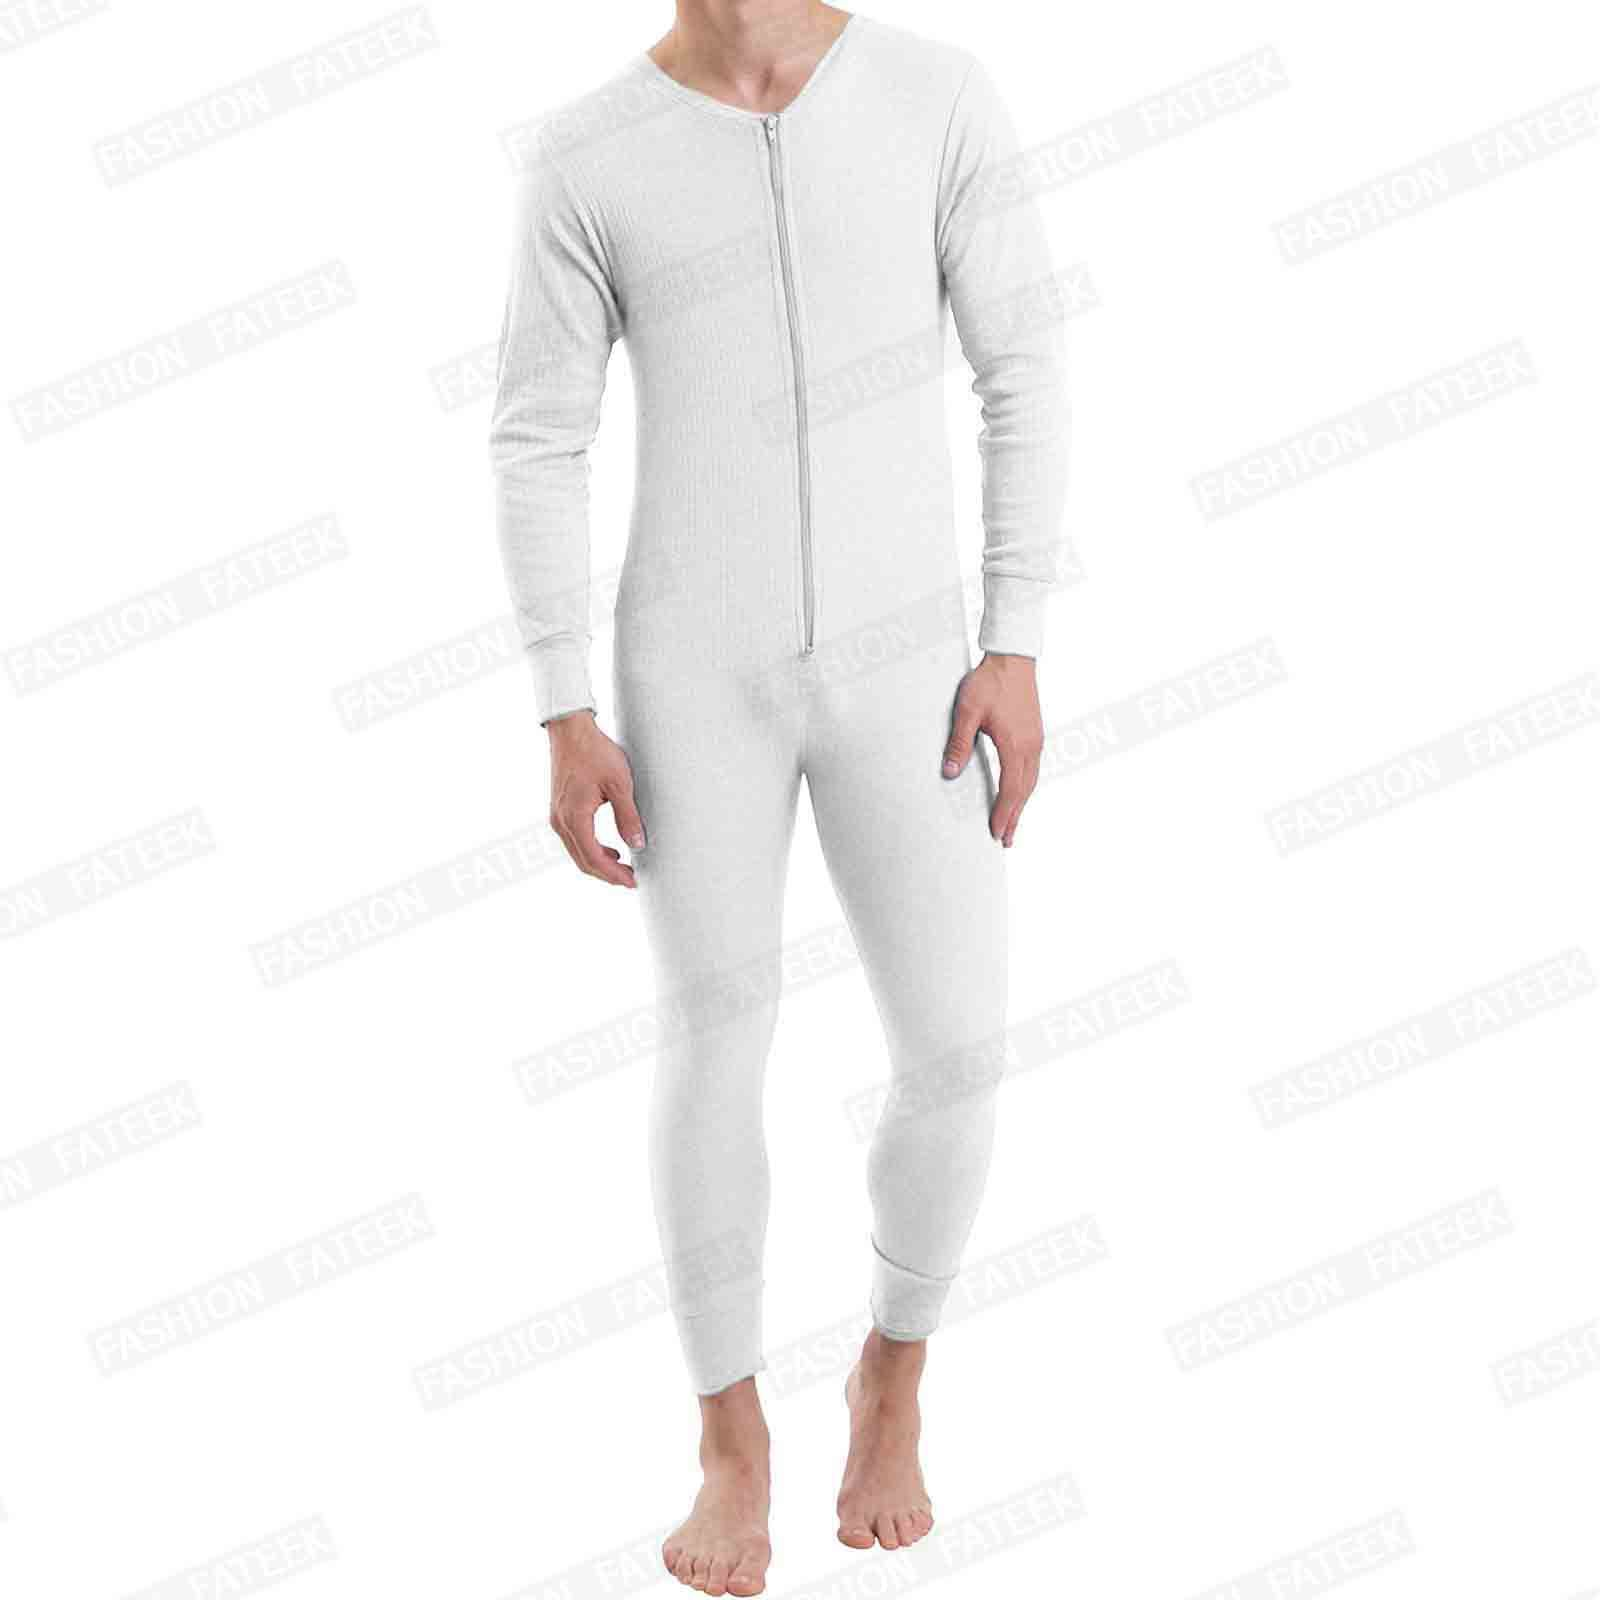 Mens thermal onesie underwear all in one set baselayer zip for Mens dress shirt onesie